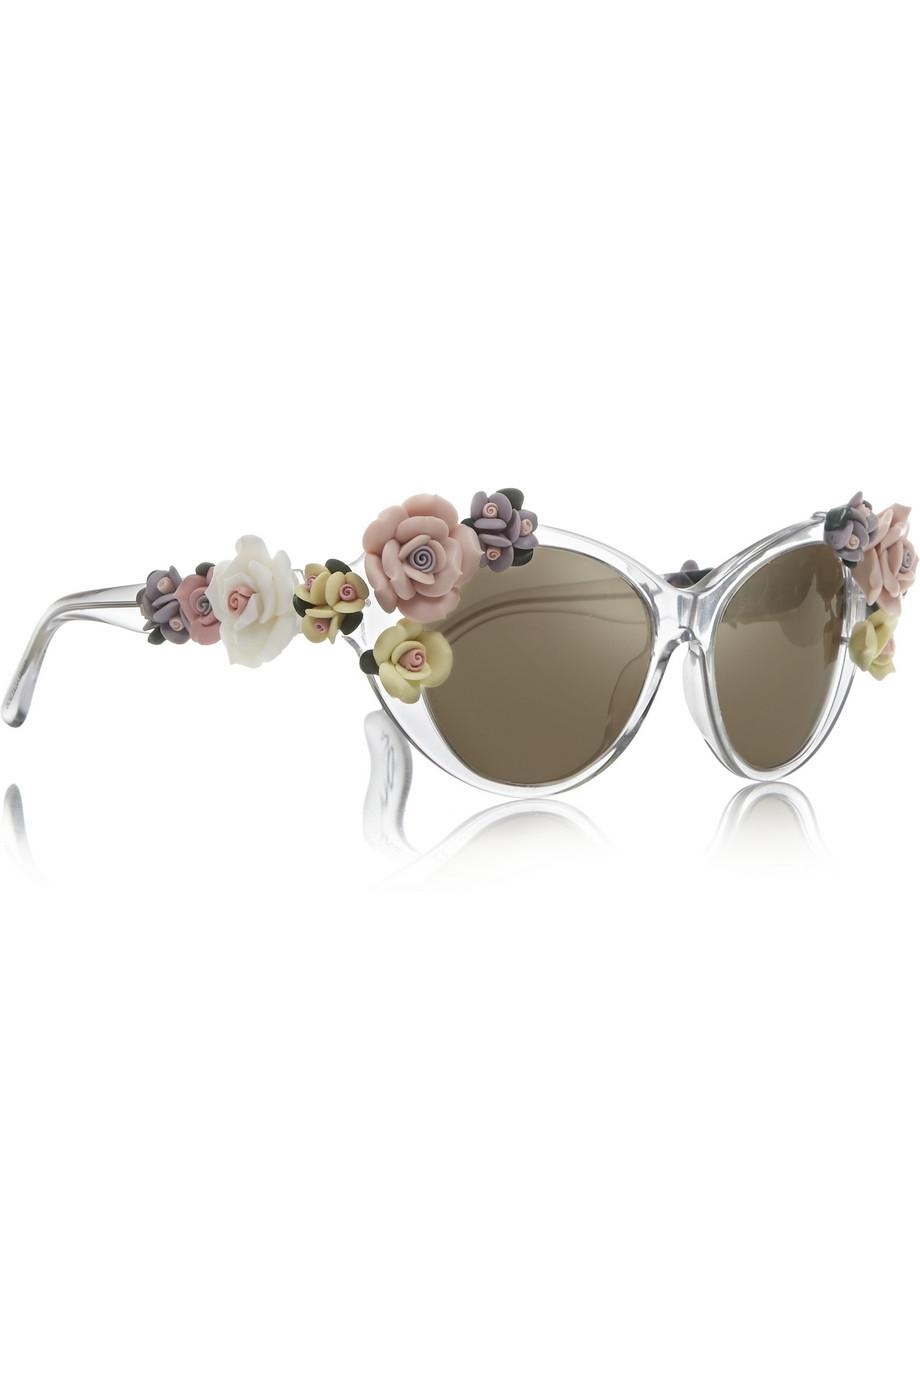 06f0df5e95e3 Lyst - Dolce   Gabbana Cat Eye Embellished Mirrored Acetate Sunglasses